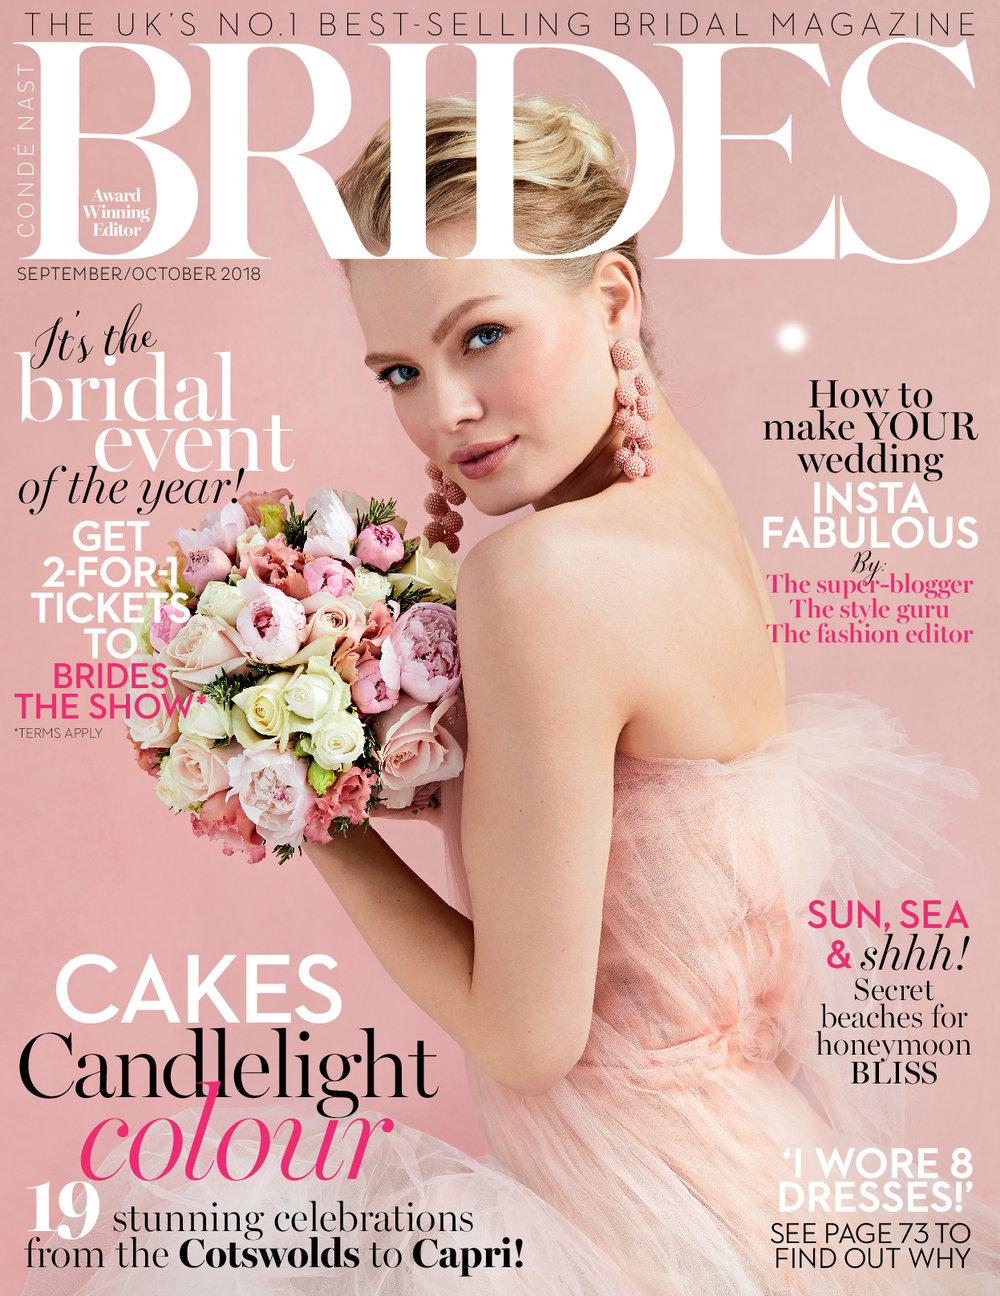 brides-cover.jpg